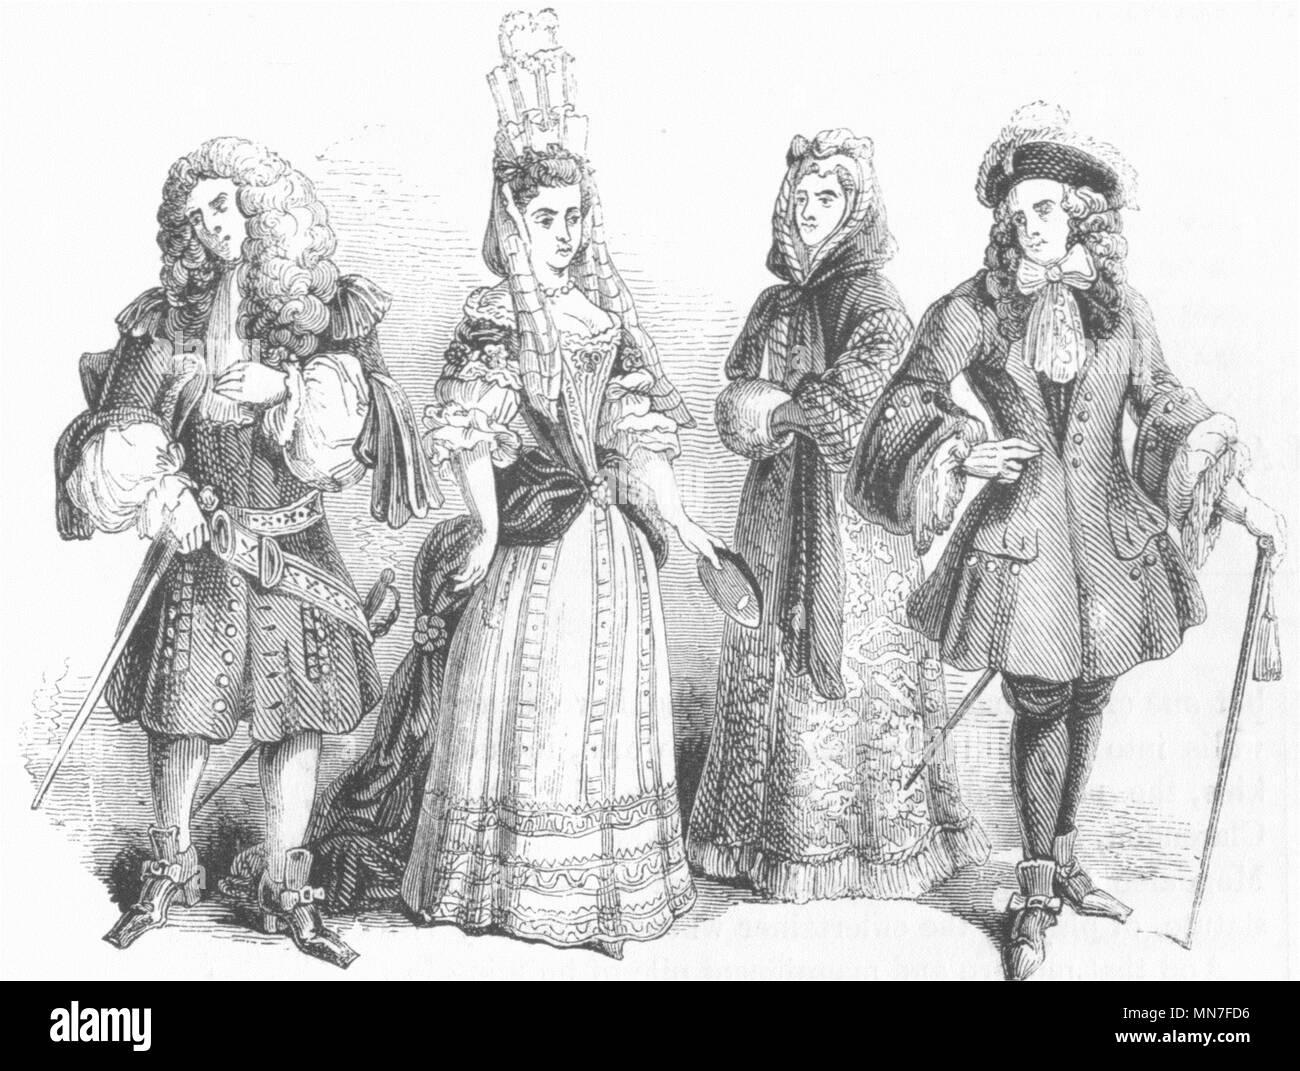 COSTUME. Di nobiltà & gentry, William & Mary c1690 1845 antica stampa Immagini Stock